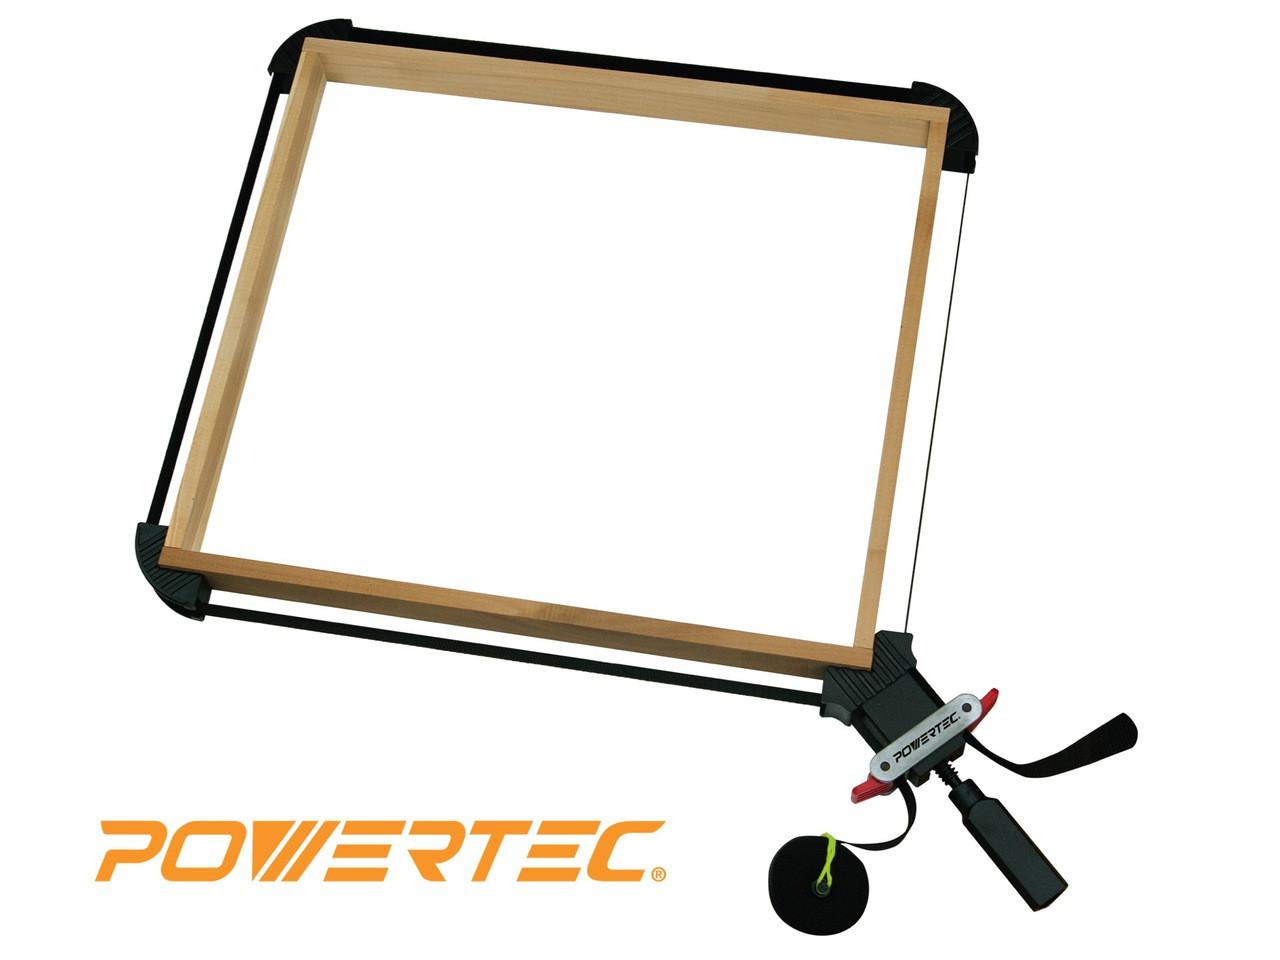 POWERTEC 71012 Drill Press Clamp 9-Inch